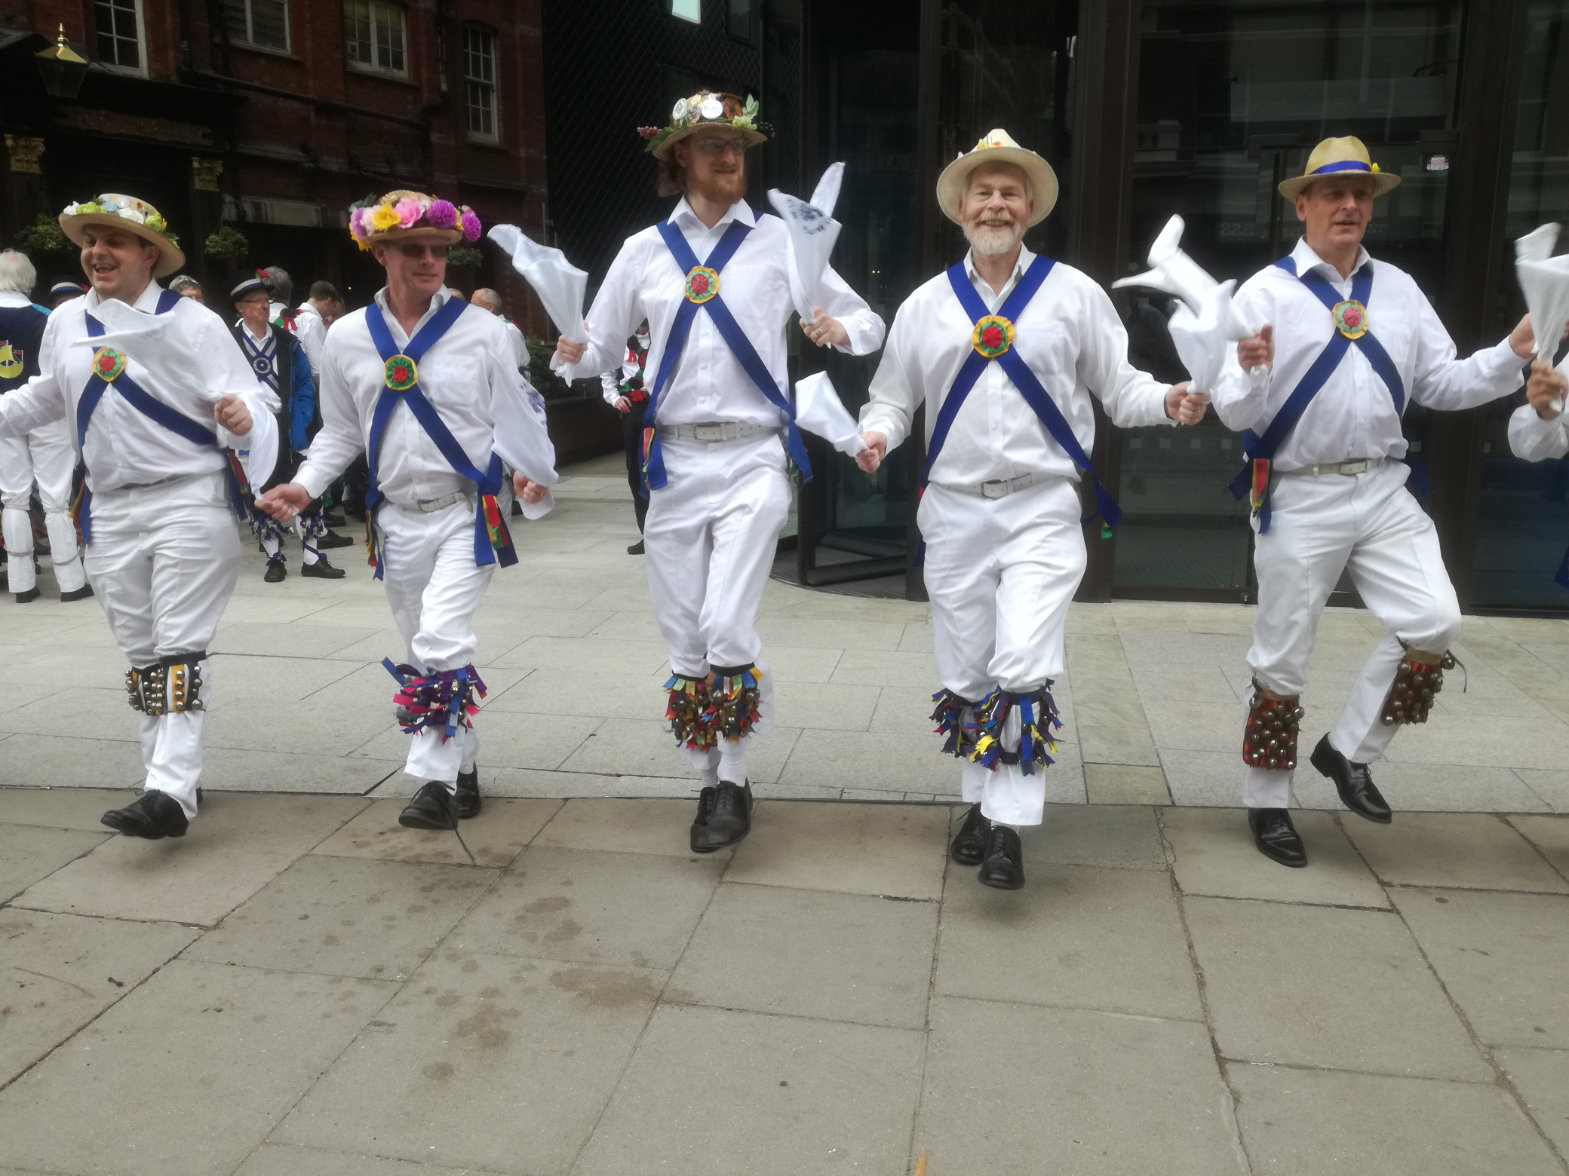 Dancing Jockey to the Fair in Westminster